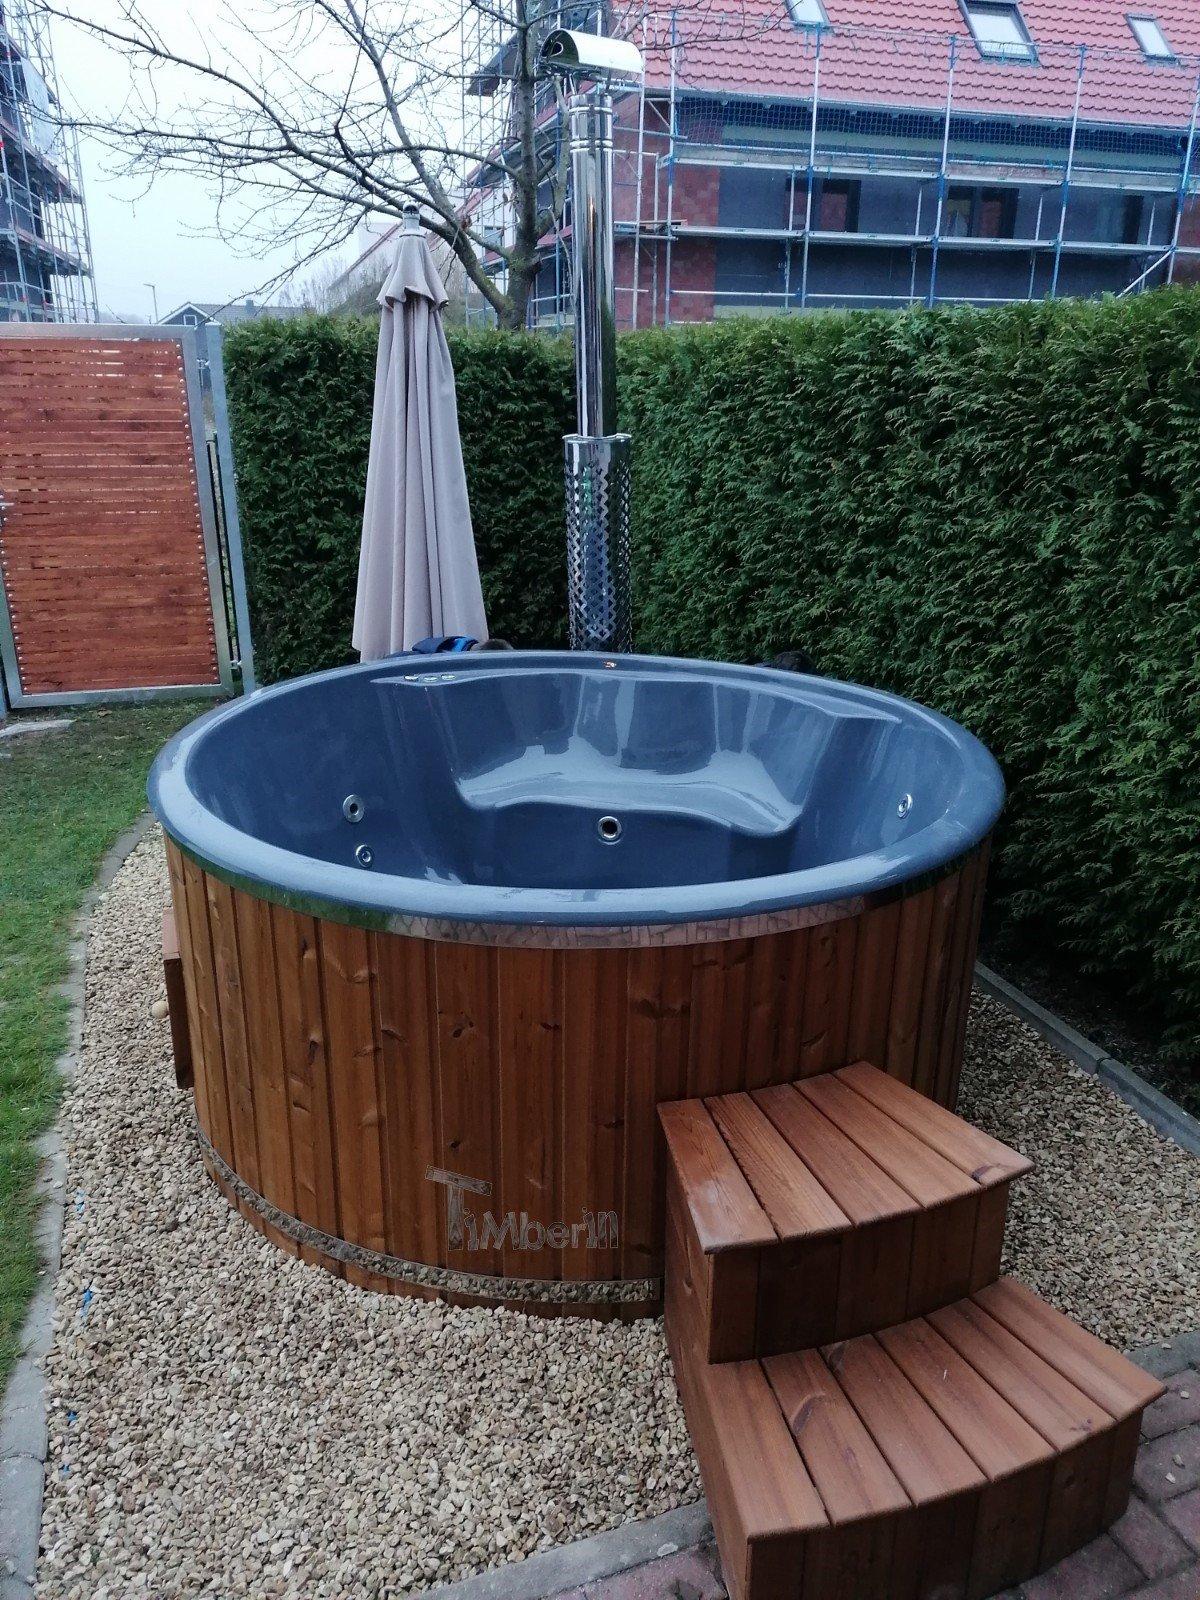 Badefass gfk mit Whirlpool Wellness Royal Sven Lengede Deutschland 1